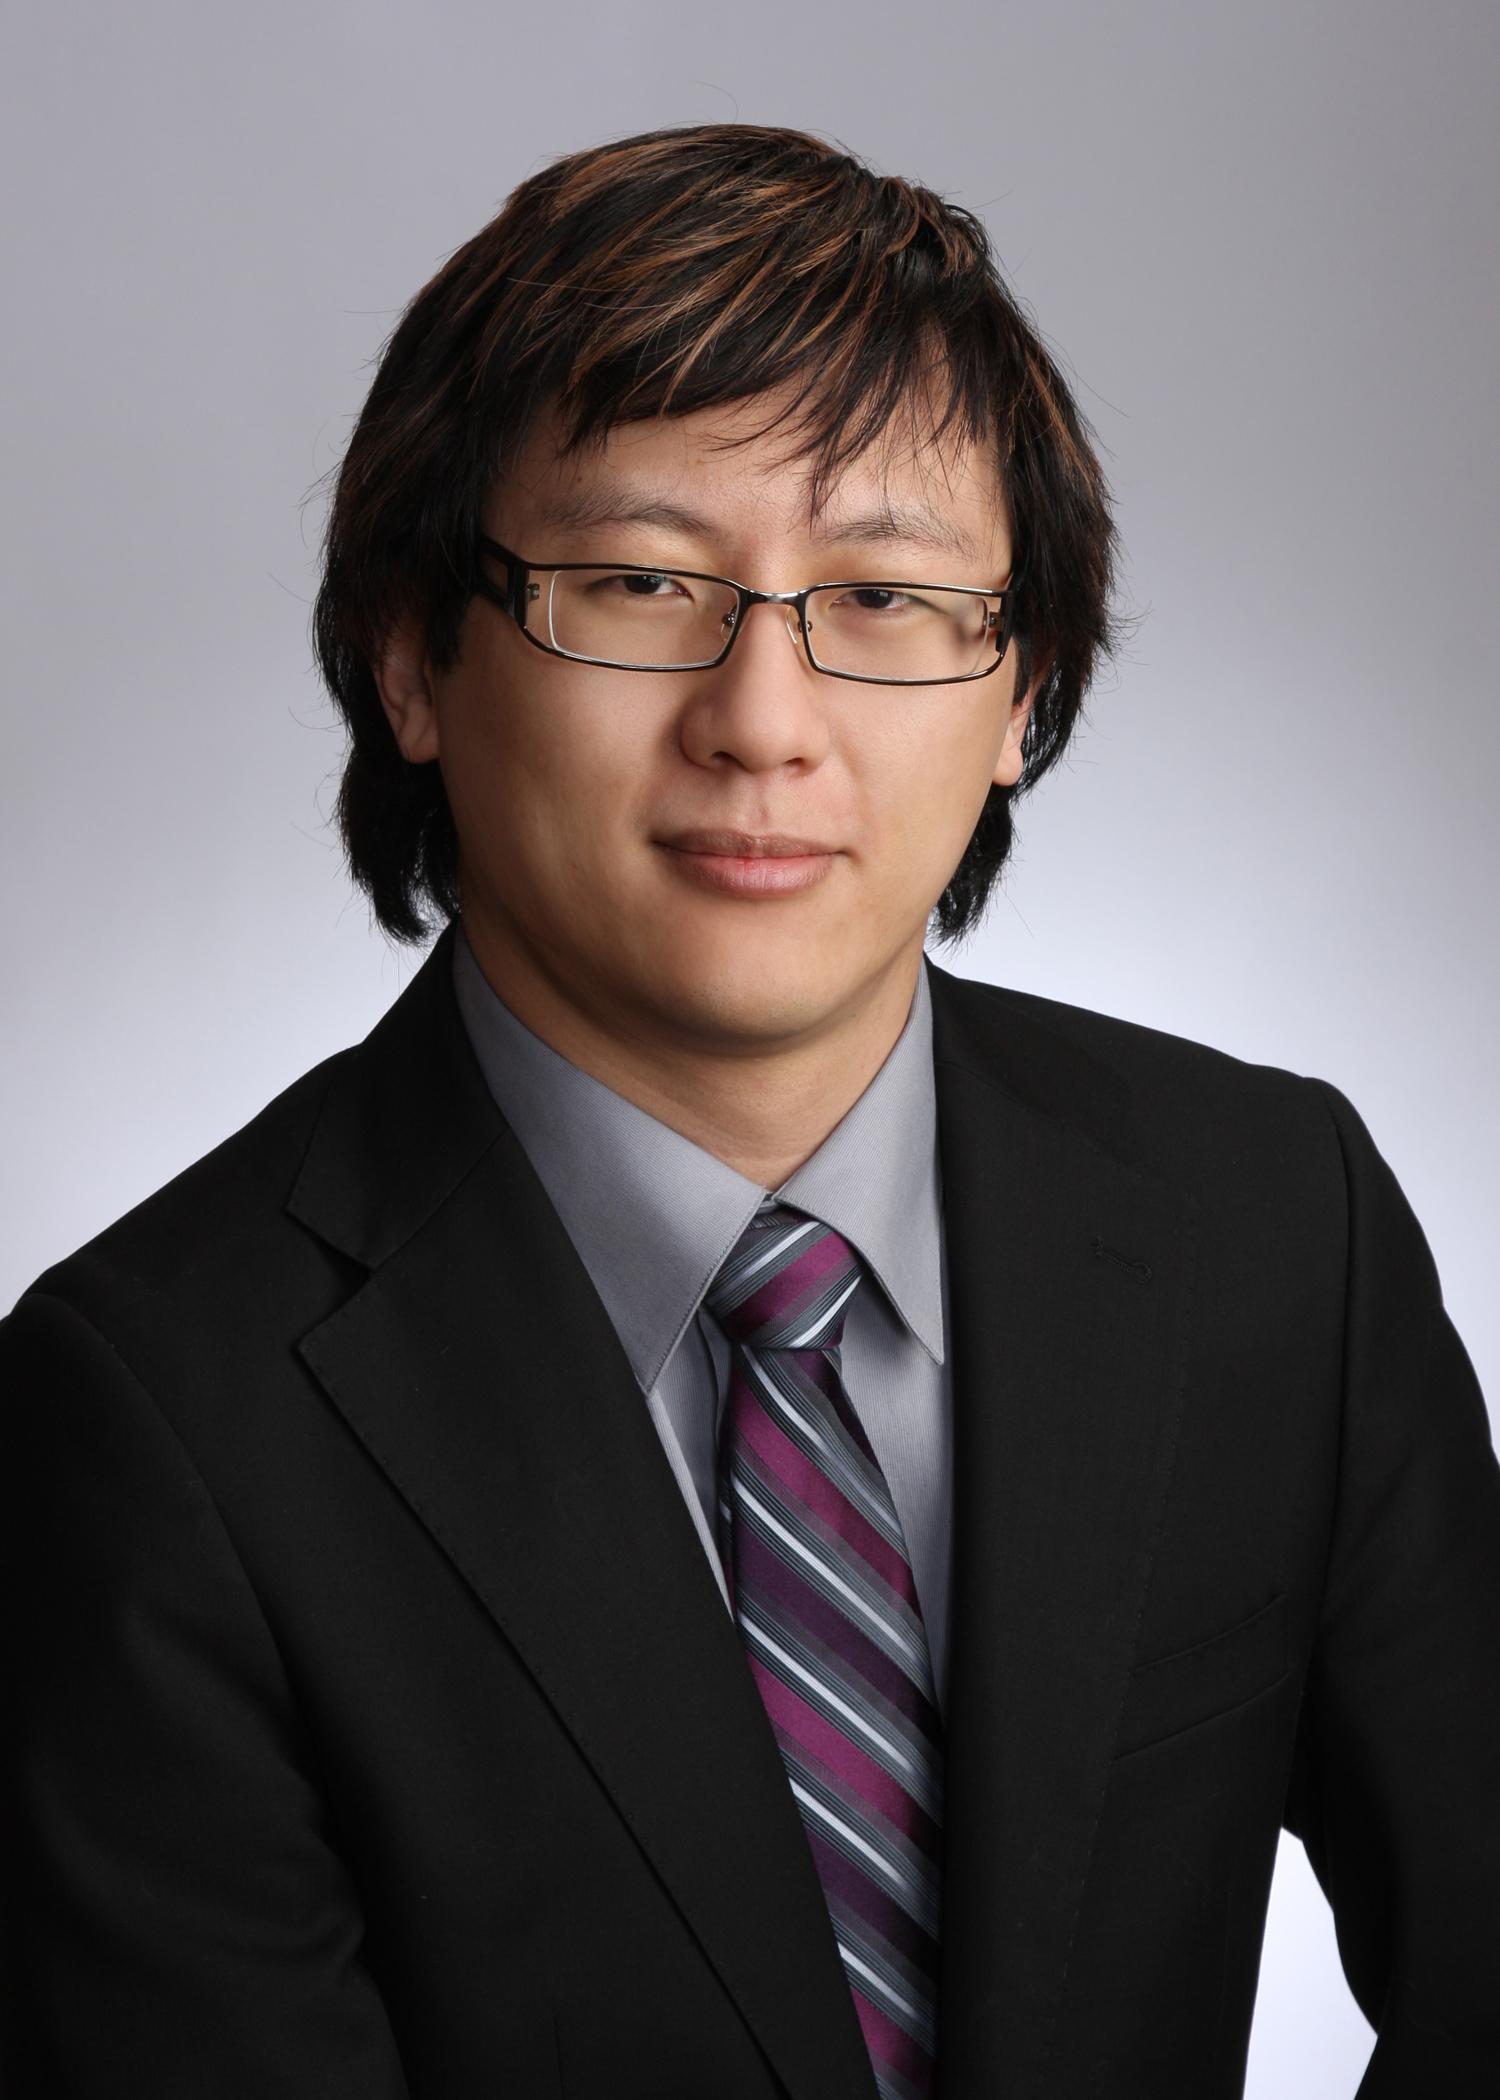 Gary Chen